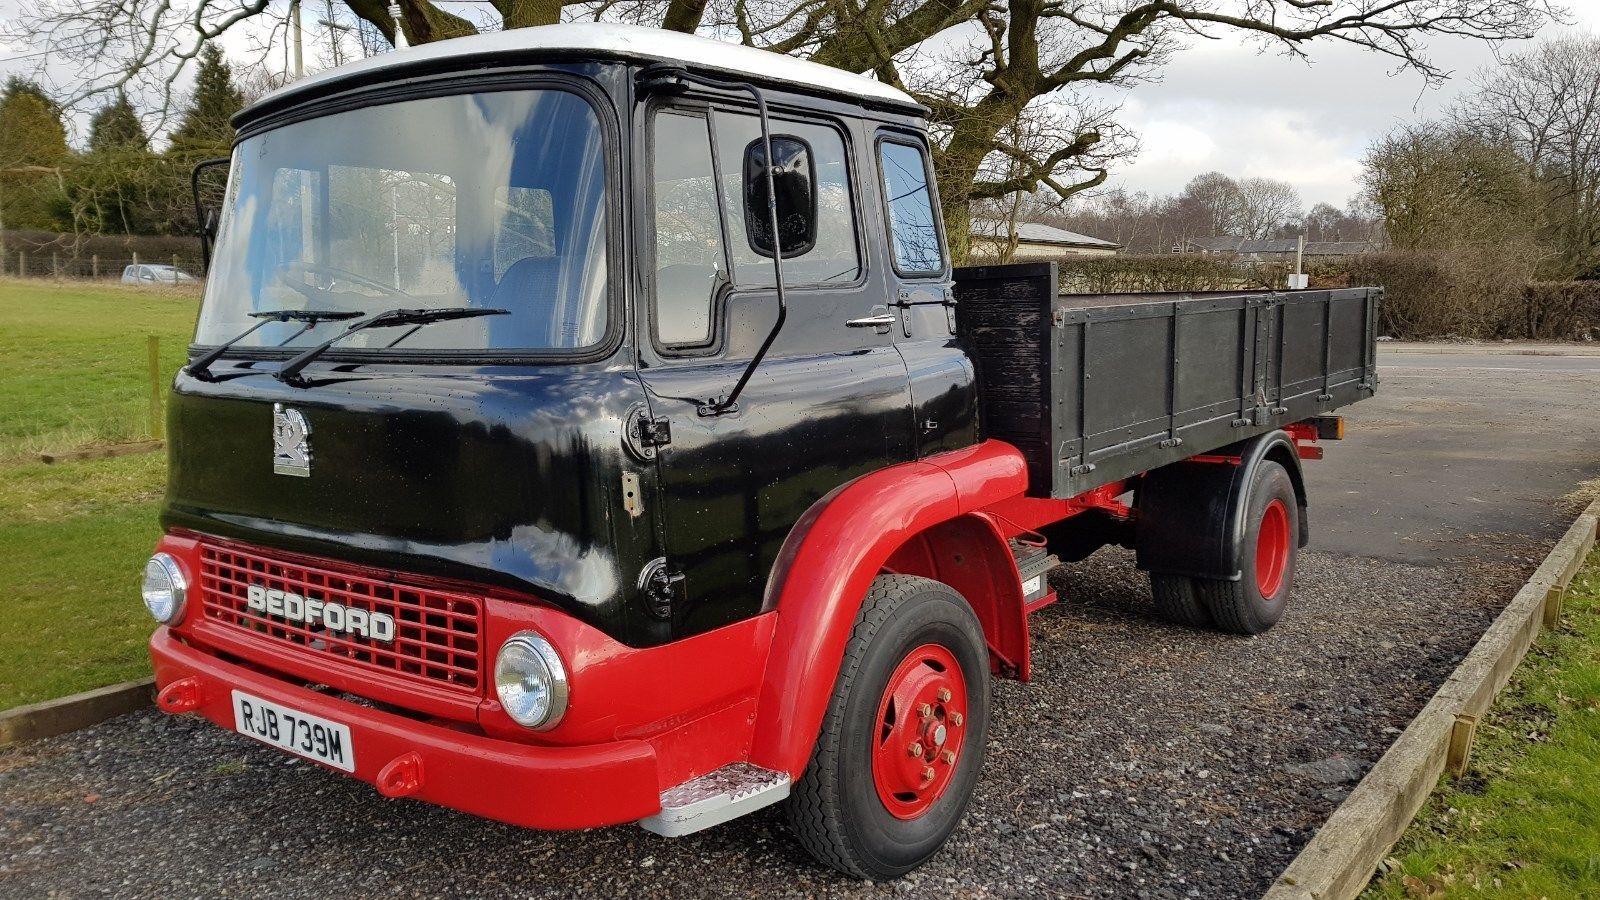 eeea7994a1 eBay  1974 Bedford TK330 Diesel flat bed swb lorry BARN FIND drives great 5  speed box